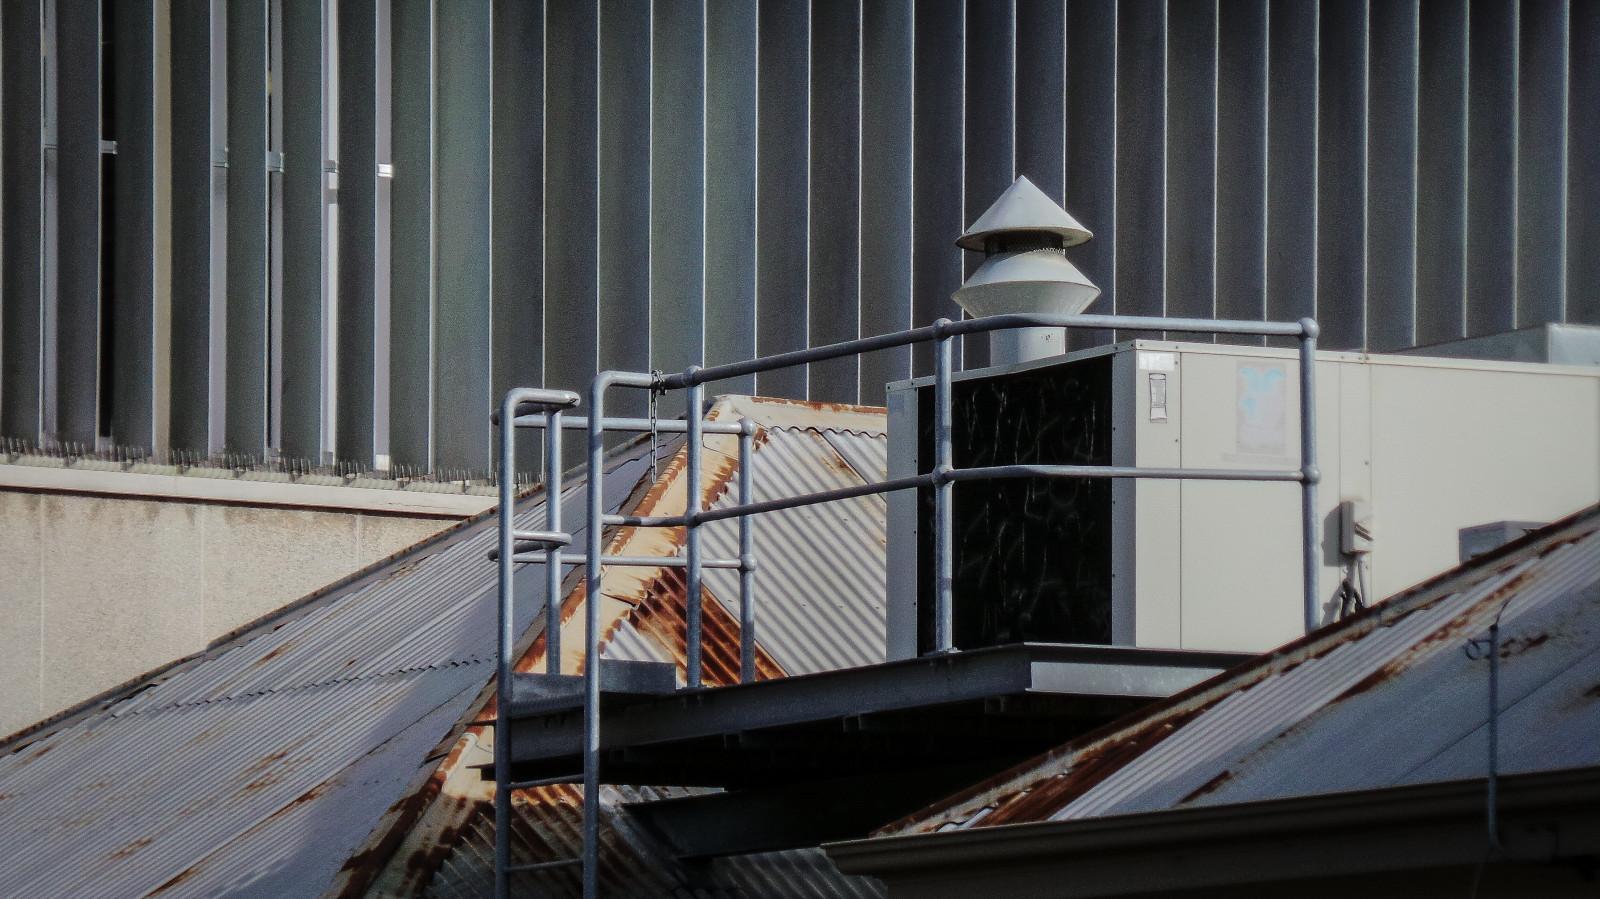 Fondos de pantalla : arquitectura, edificio, techo, fachada, pretil ...